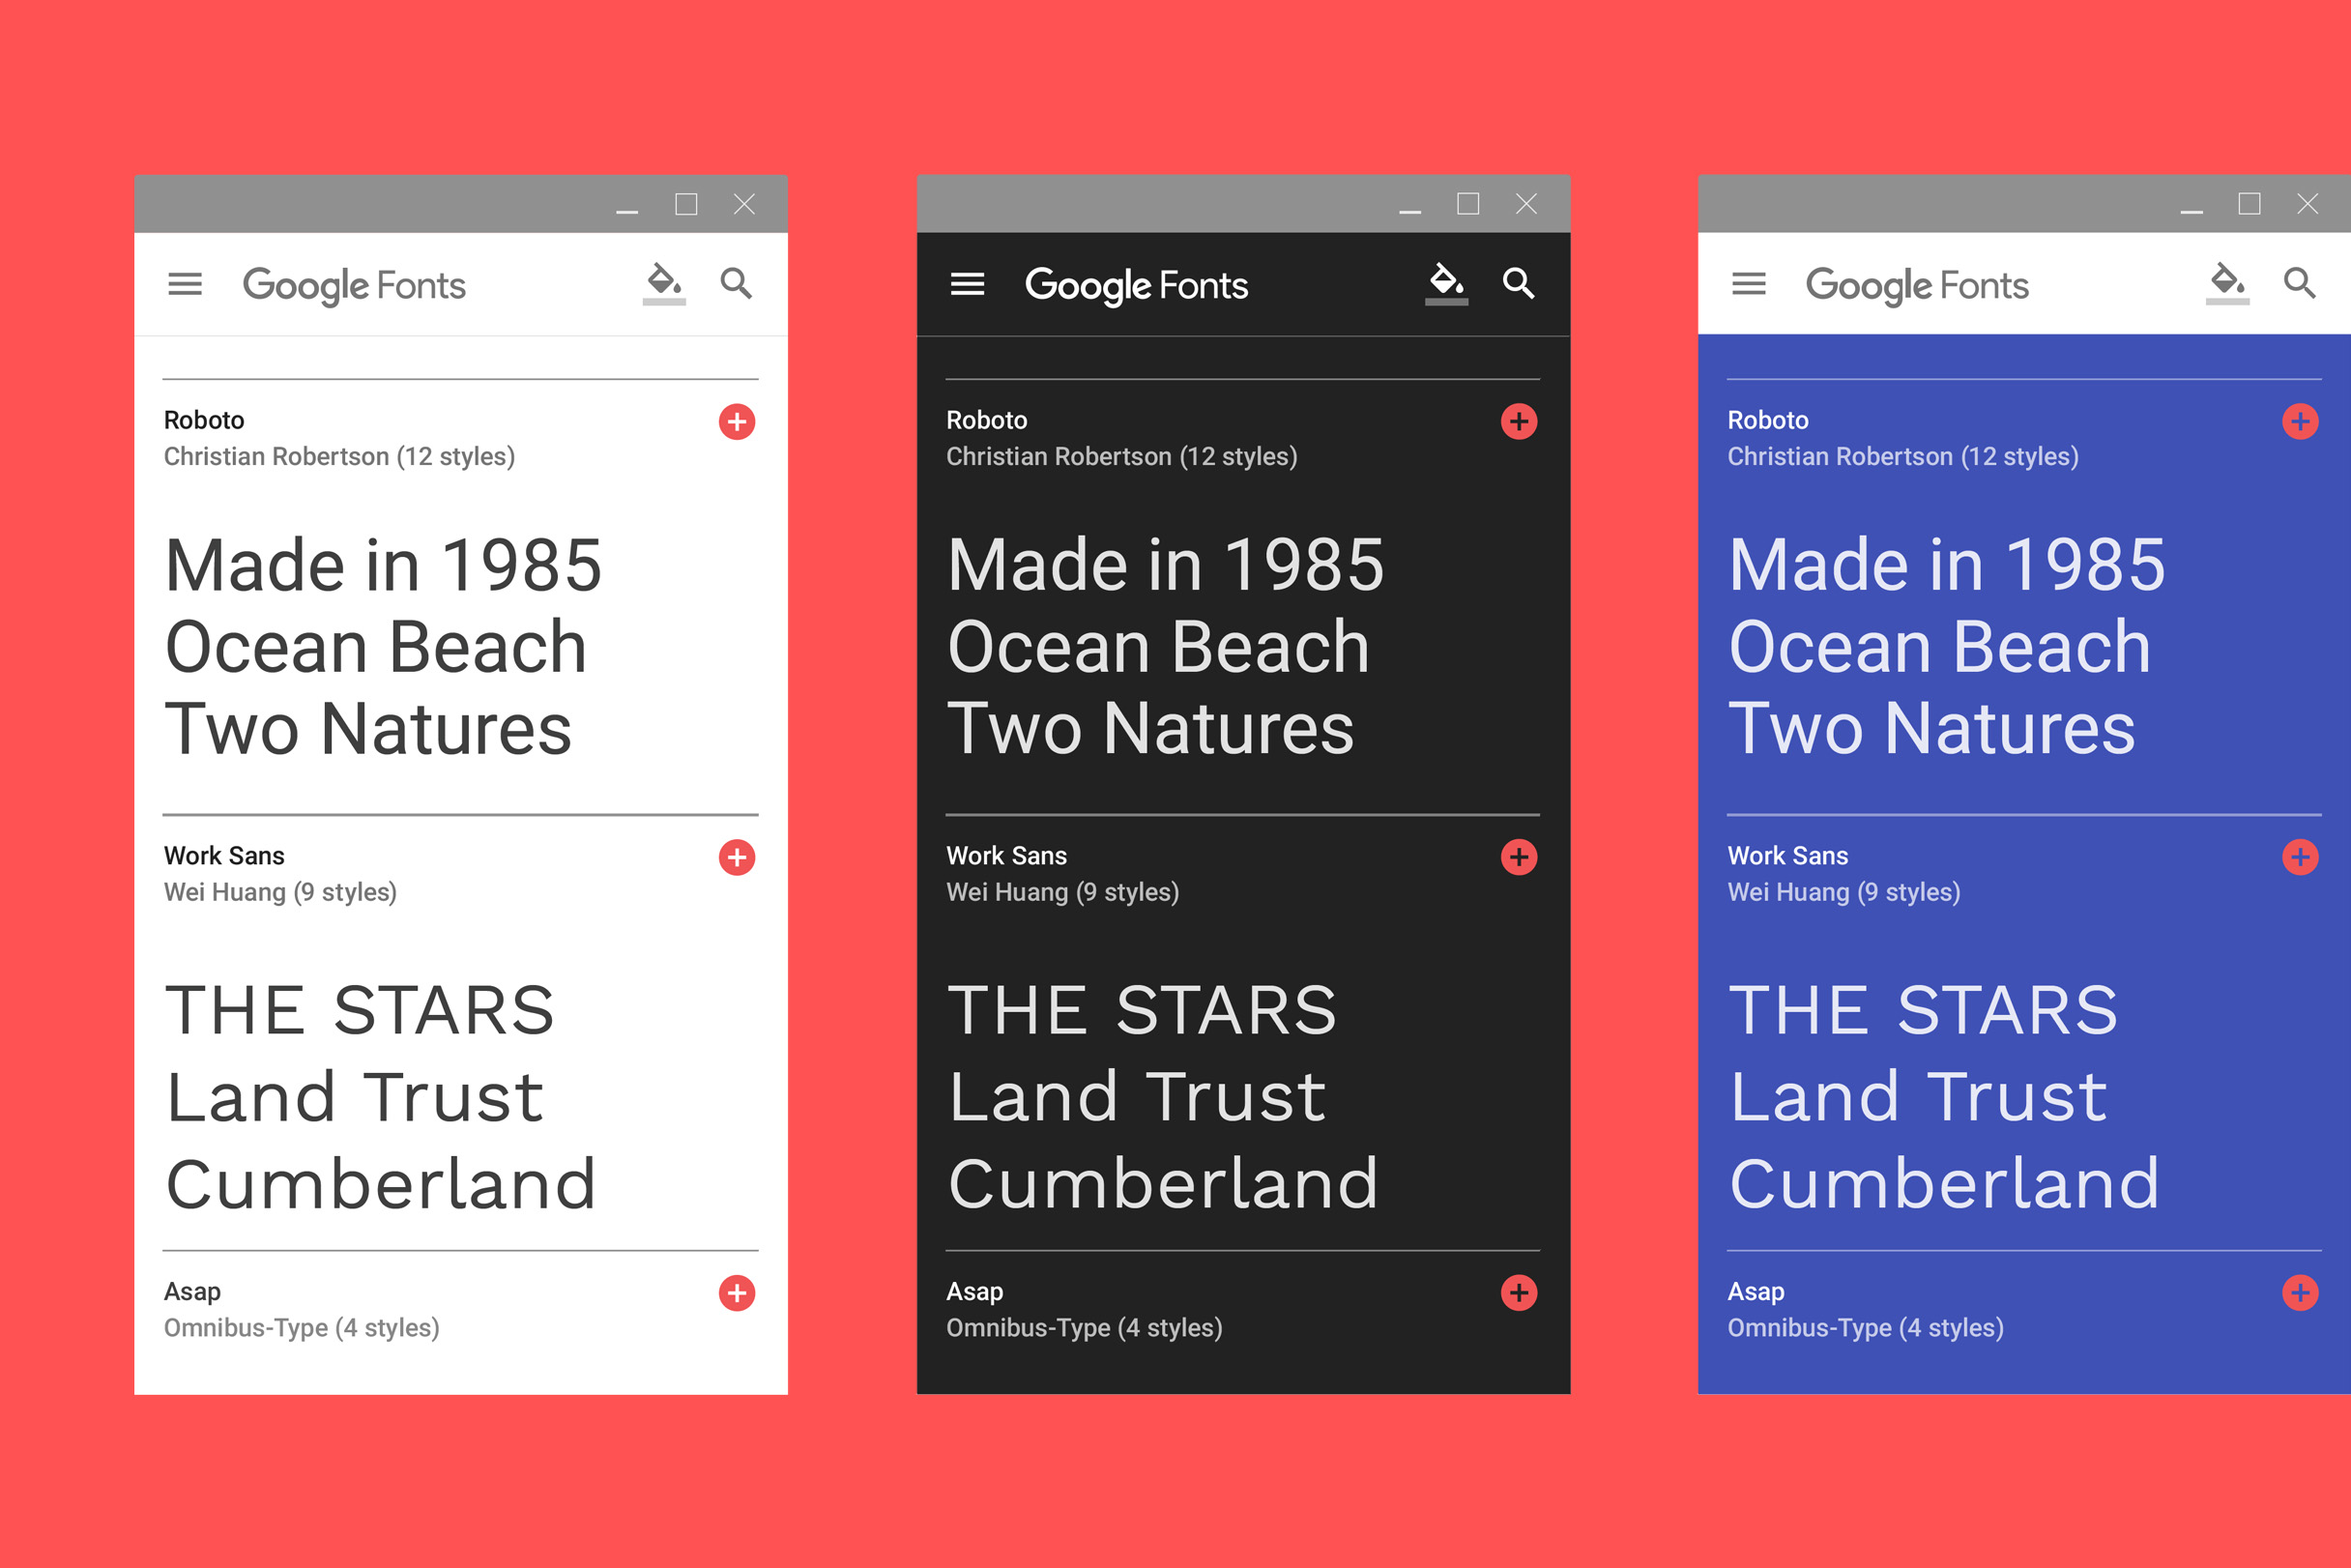 reimagining_google_fonts_3x2.jpg